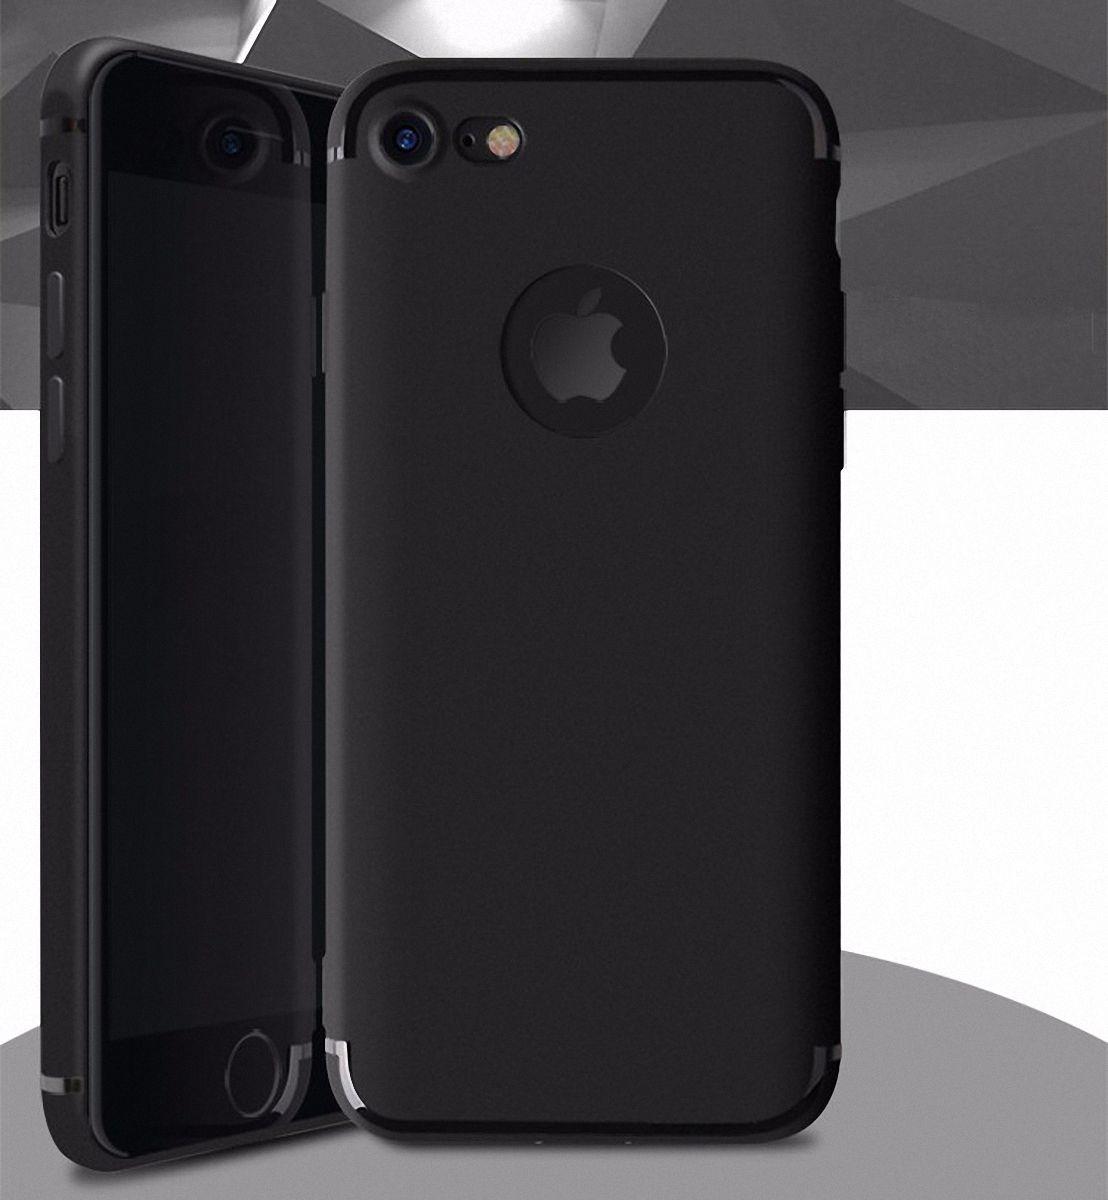 apple iphone 6 plus 6s plus handyh lle bumper case schwarz silikon h lle. Black Bedroom Furniture Sets. Home Design Ideas